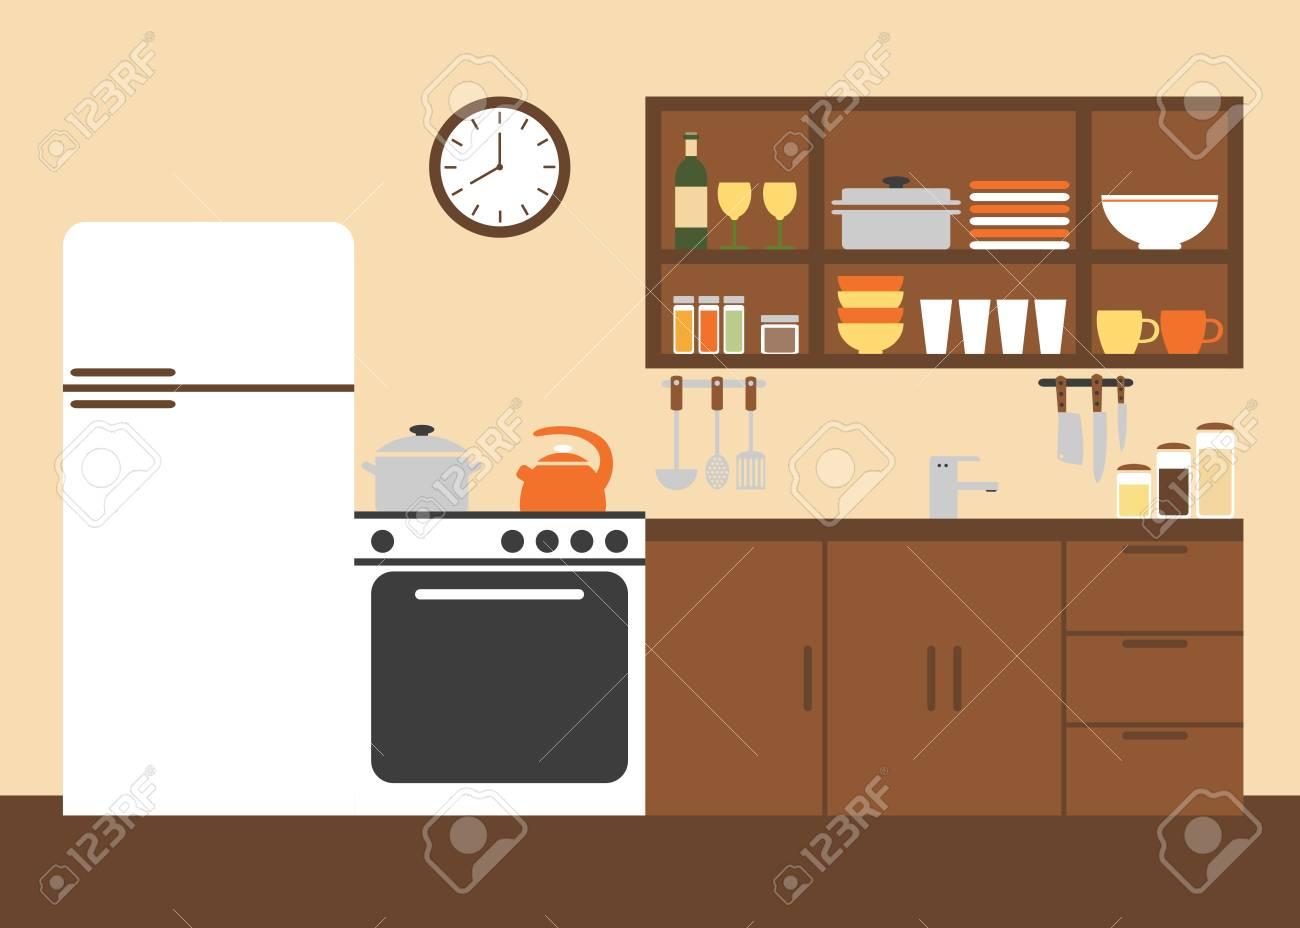 Cocina. Cocina De Diseño Interior. Muebles De Cocina Moderna ...